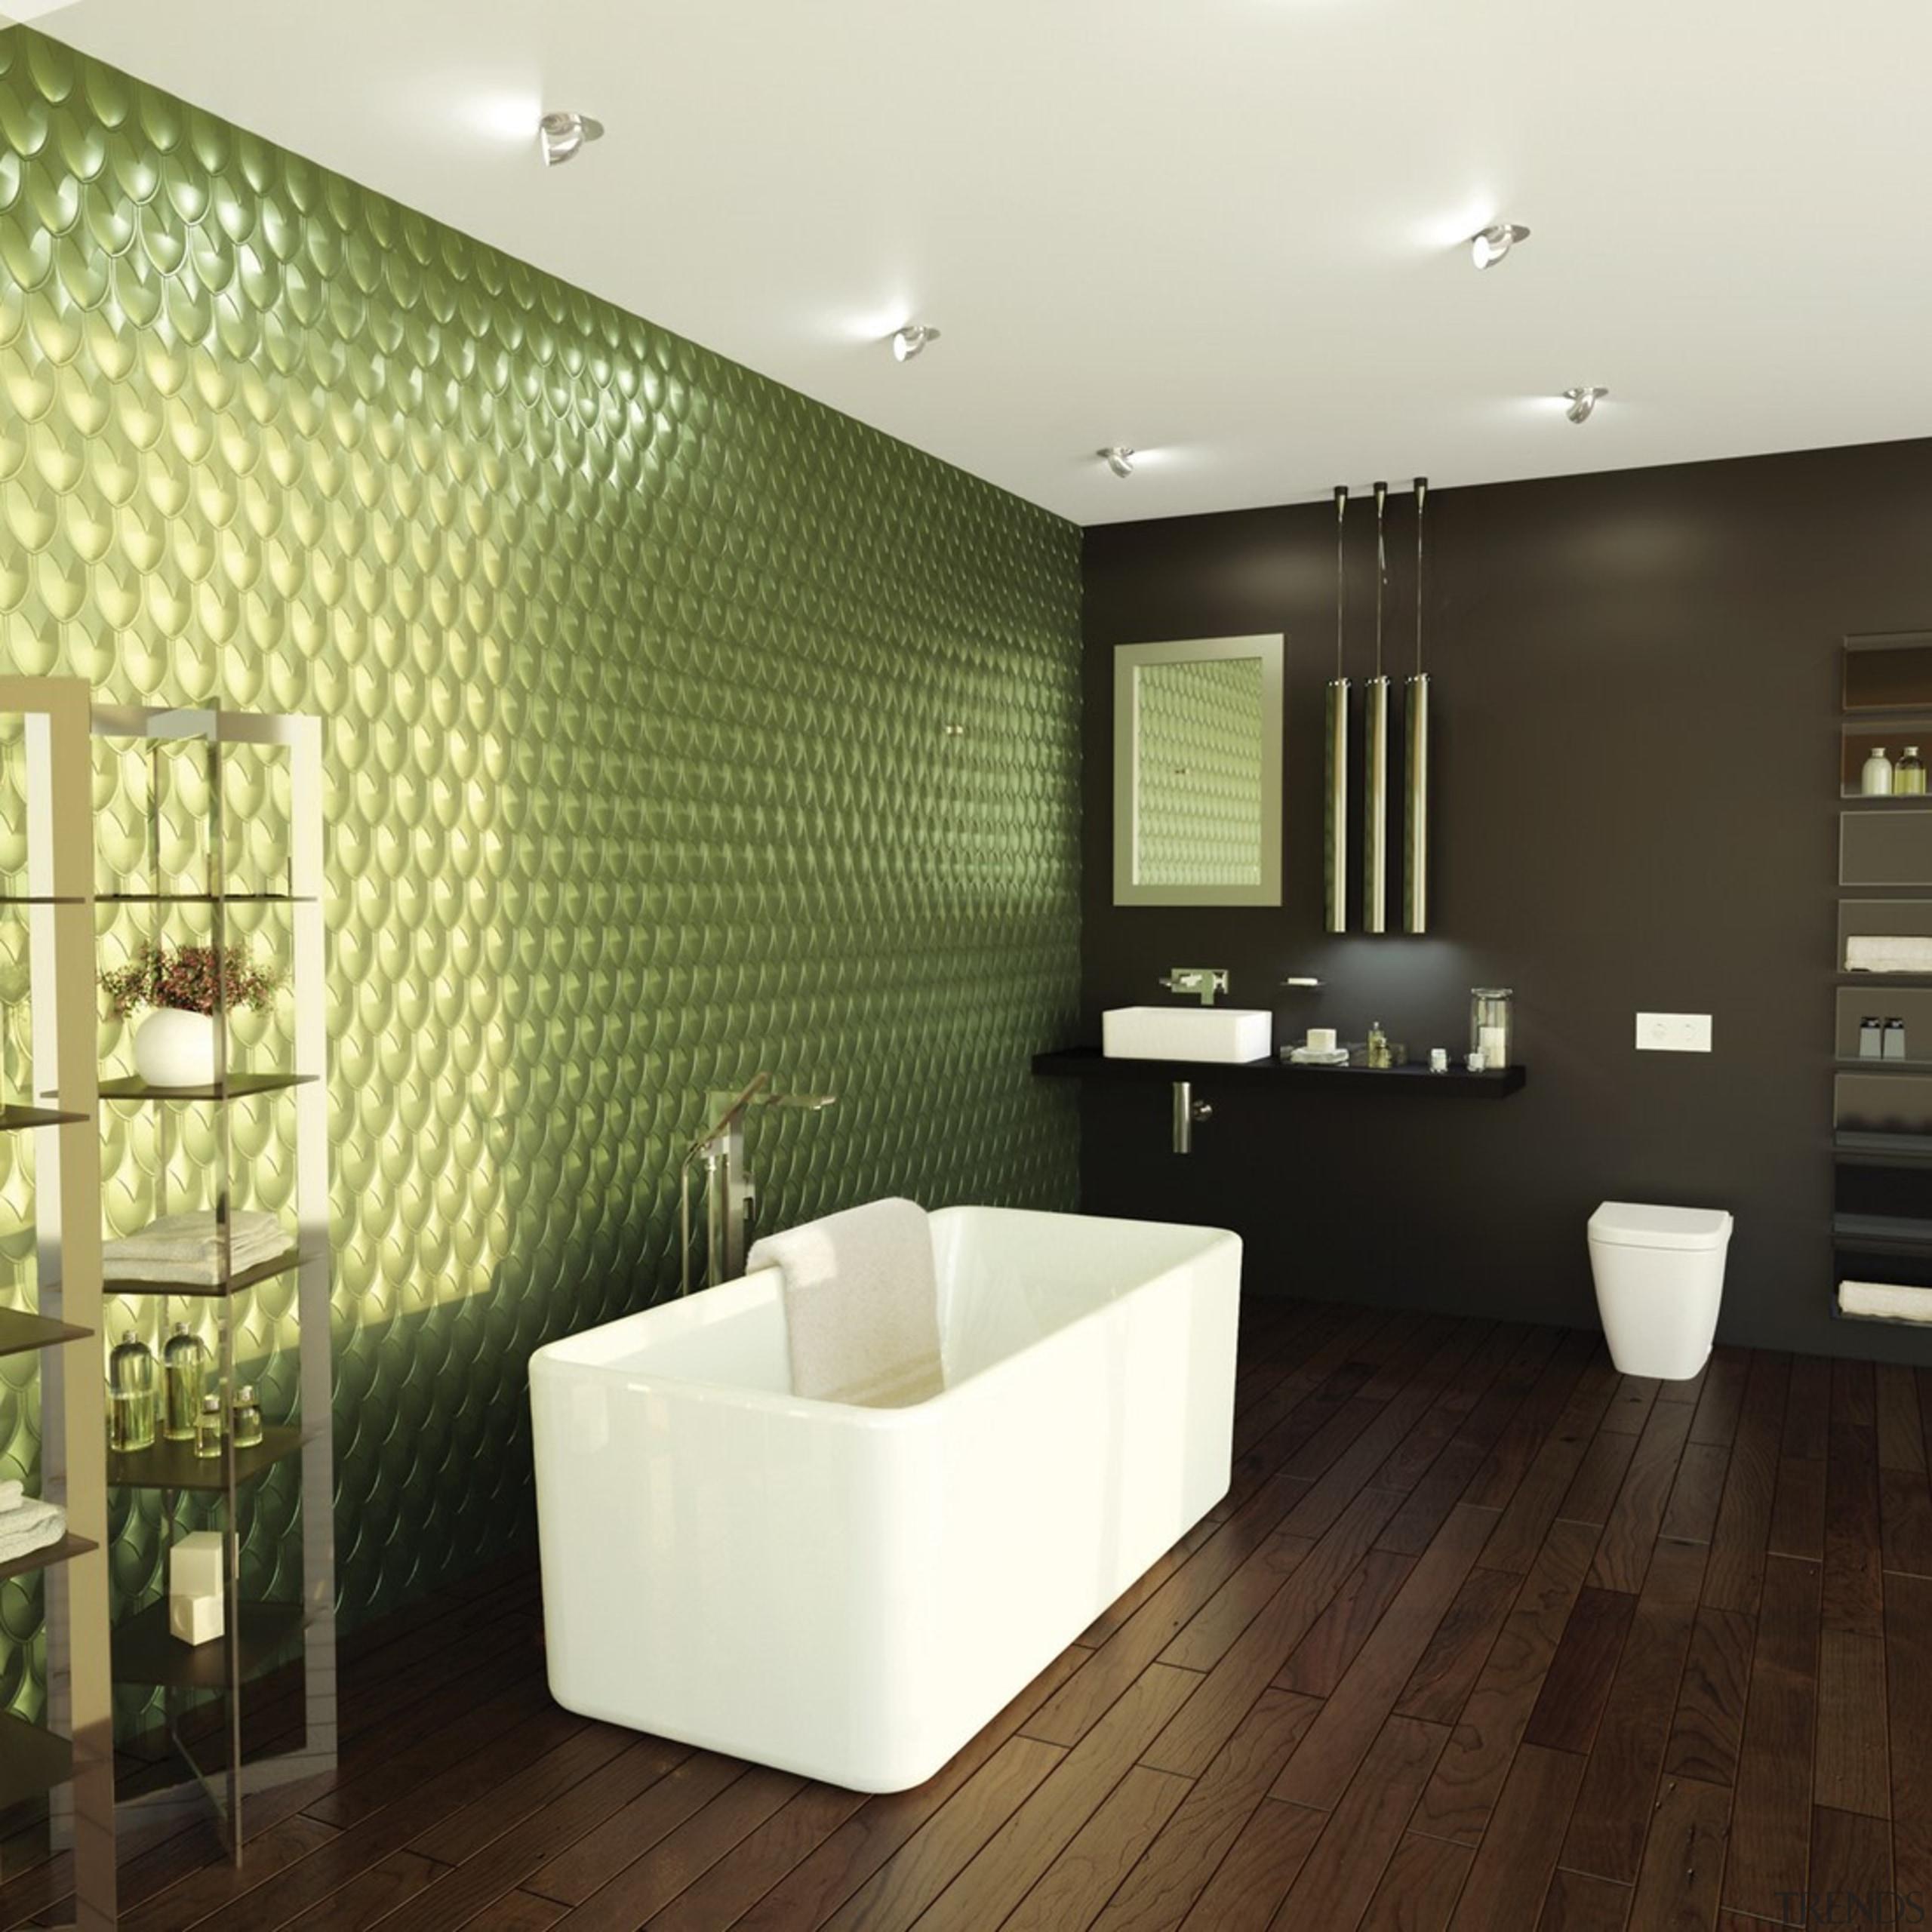 Caroma Cube - Caroma Cube - bathroom | bathroom, ceiling, floor, flooring, interior design, tile, wall, wood flooring, black, white